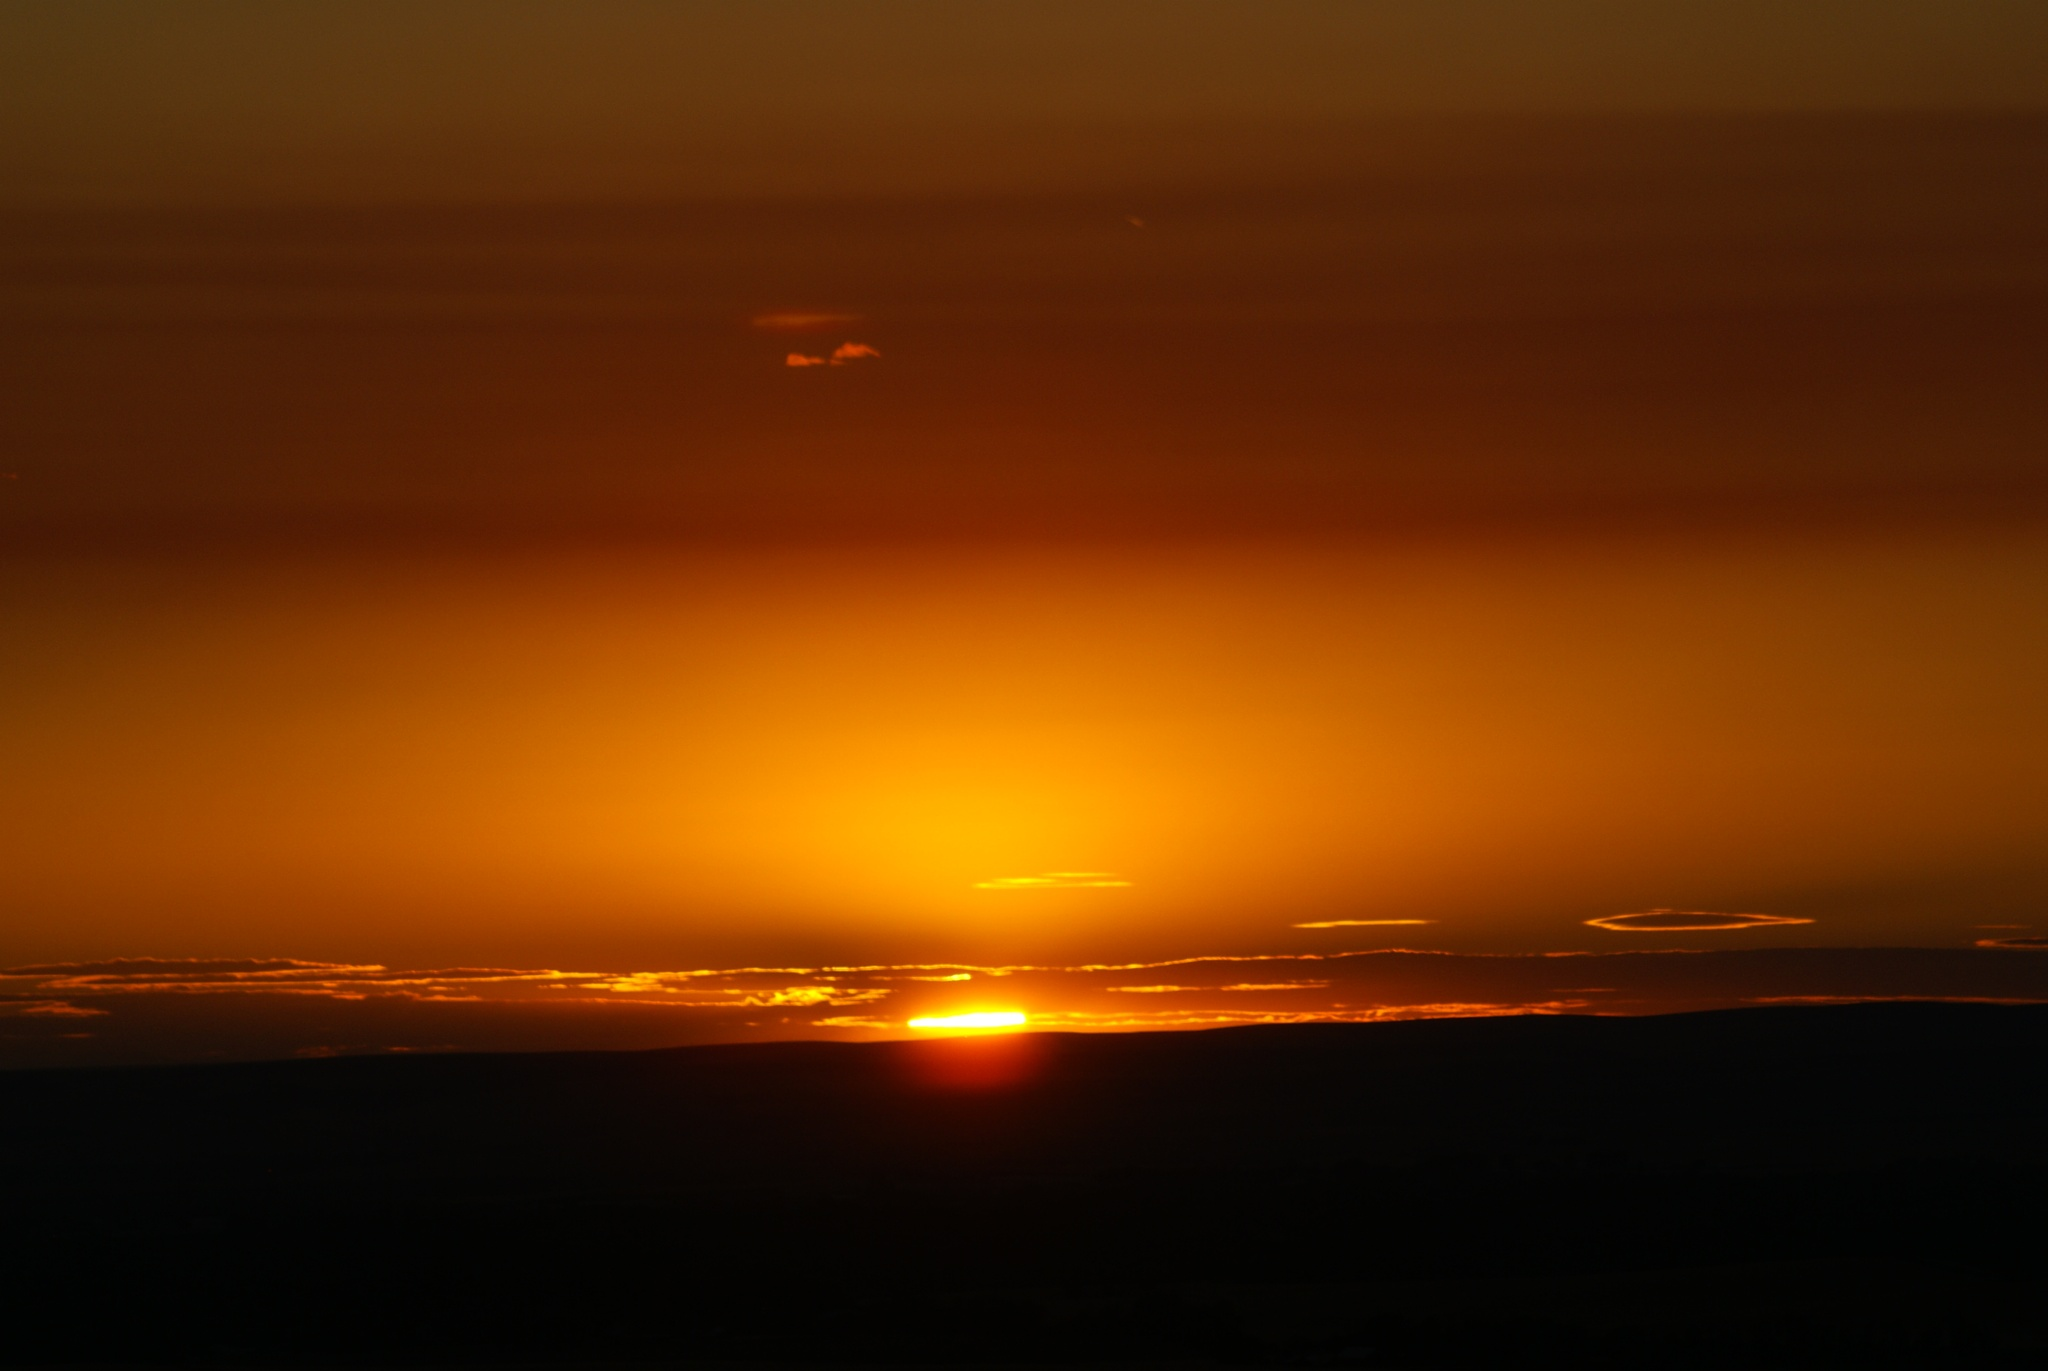 Mountain Sunset by shawna.morgan.7